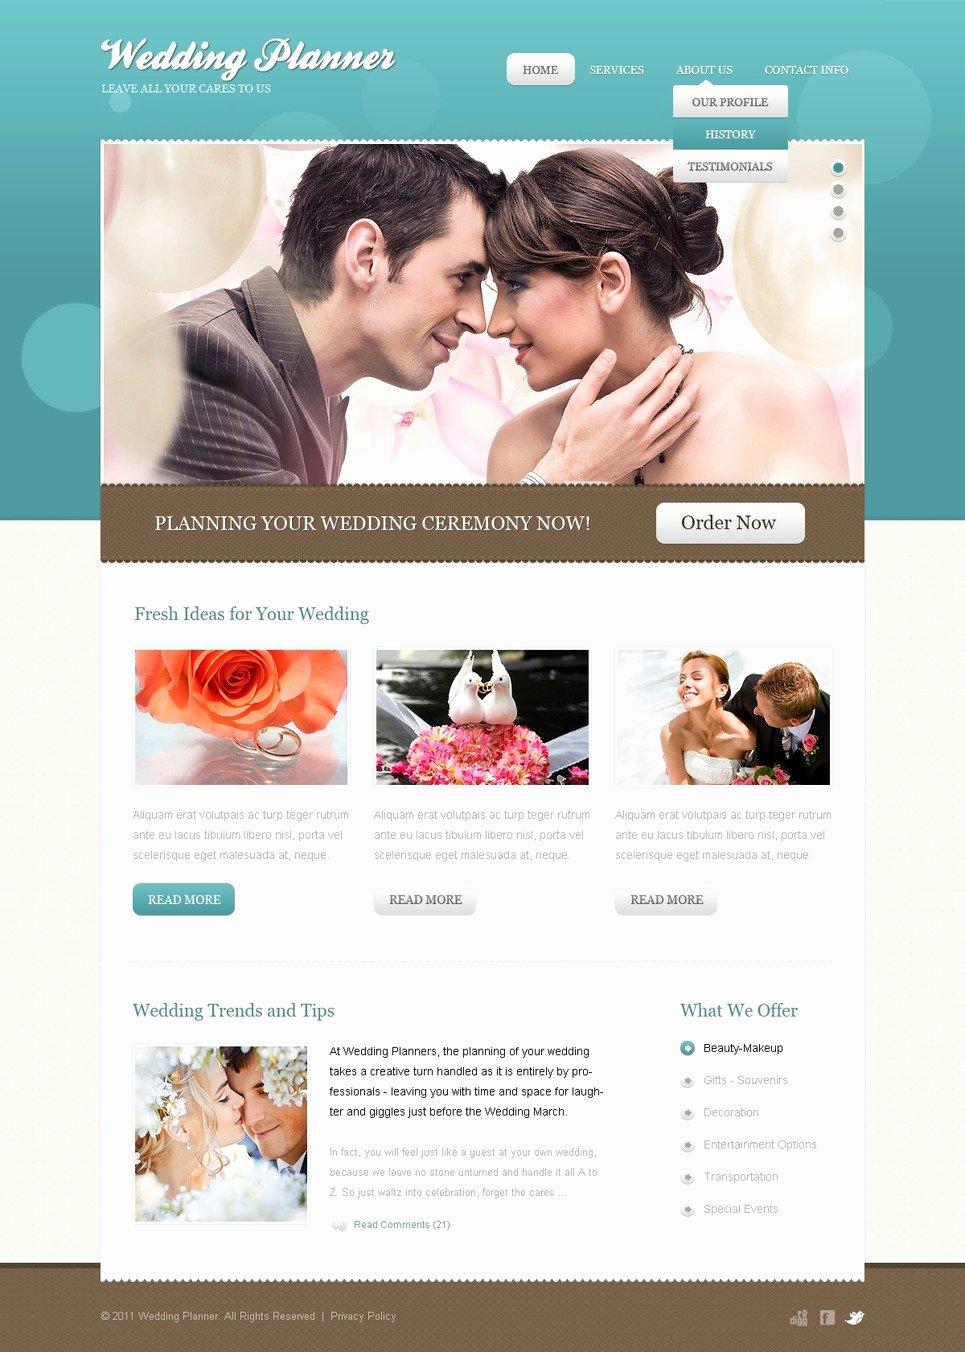 Wedding Planner Website Template Beautiful Wedding Planner Website Template